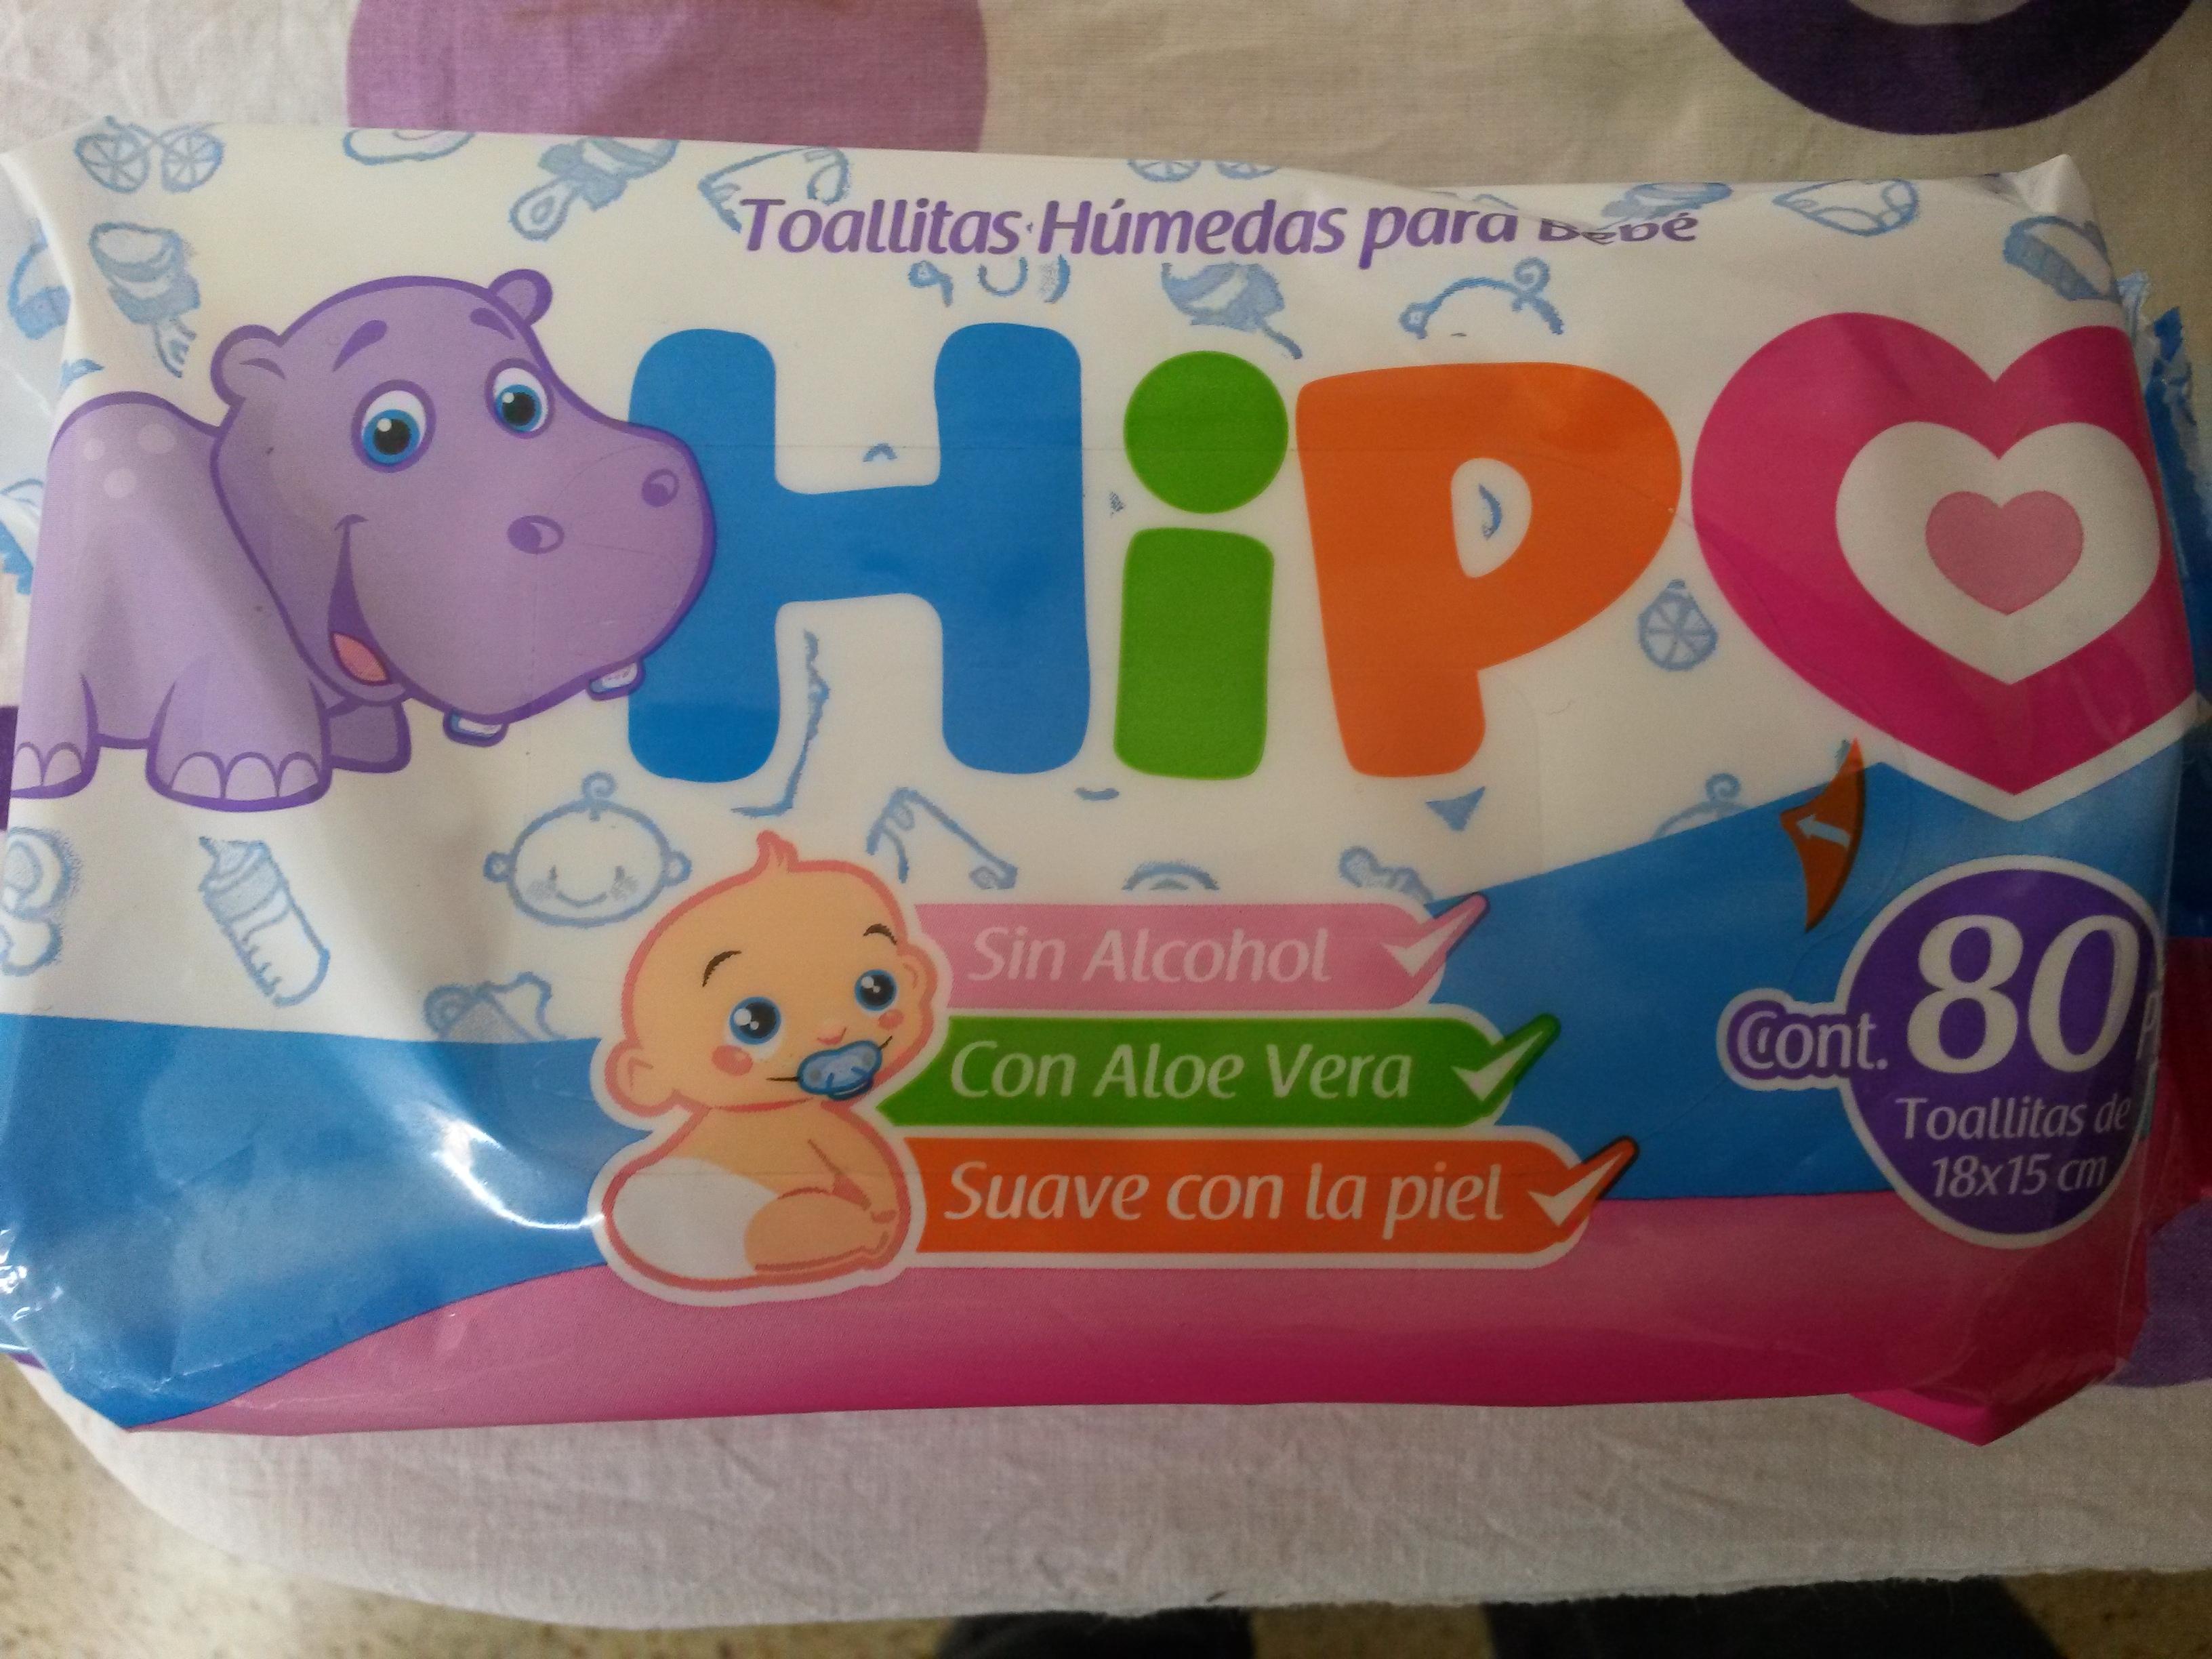 Chedraui: 80 toallitas húmedas Hipo $4.90